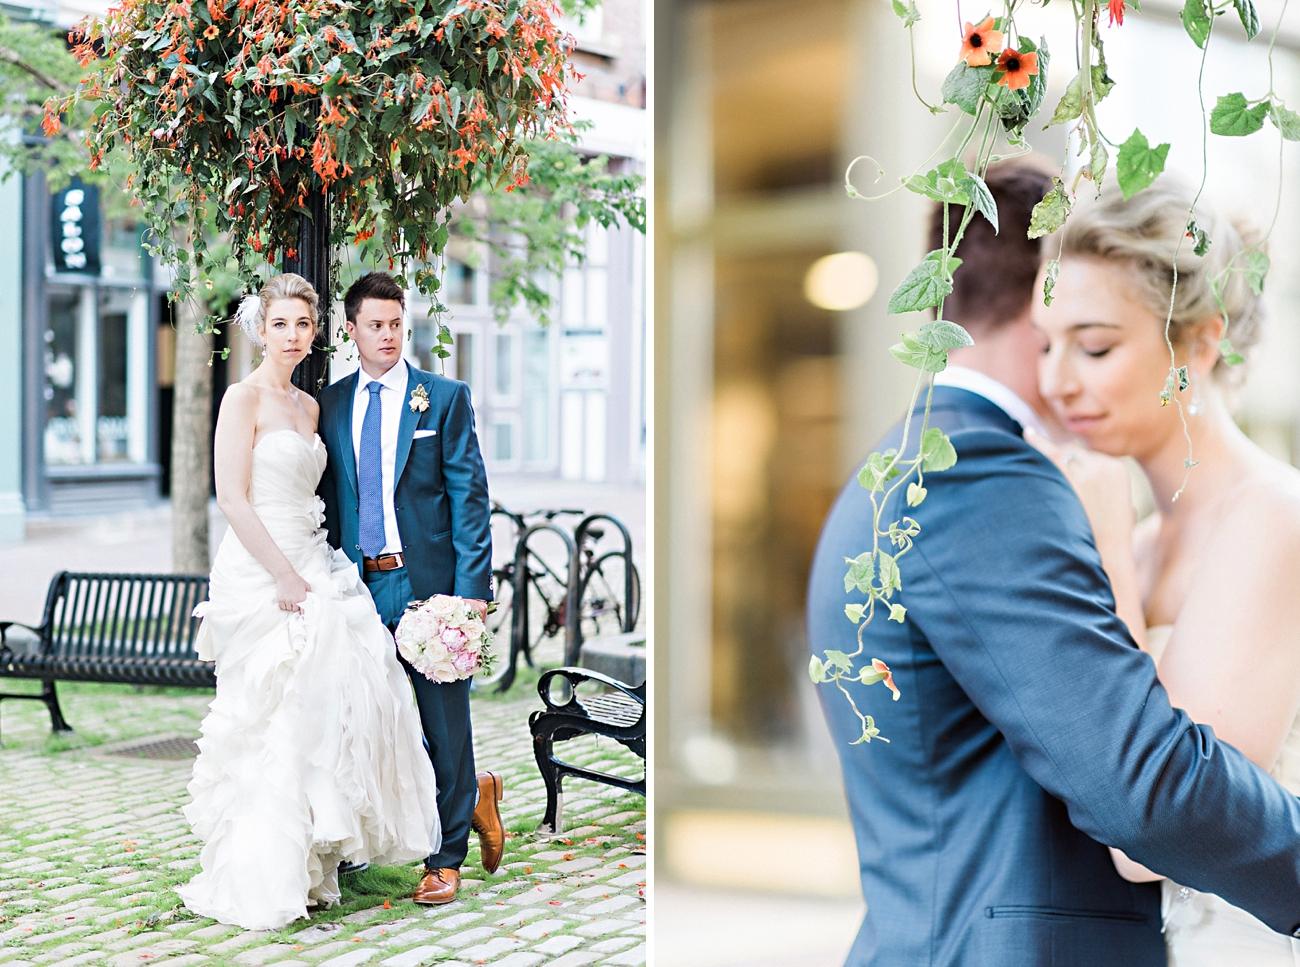 Sara-Seans-Halifax-Prince-George-Hotel-Wedding059.jpg